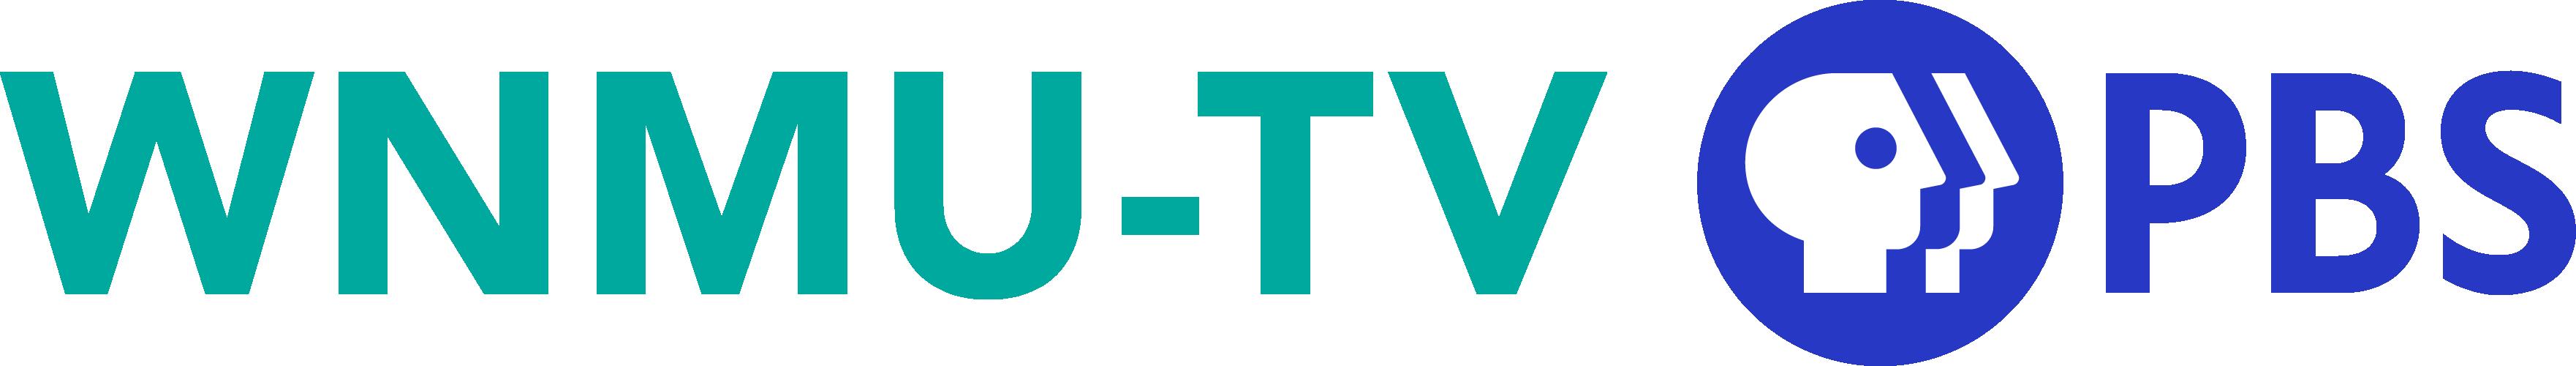 WNMU Public TV 13